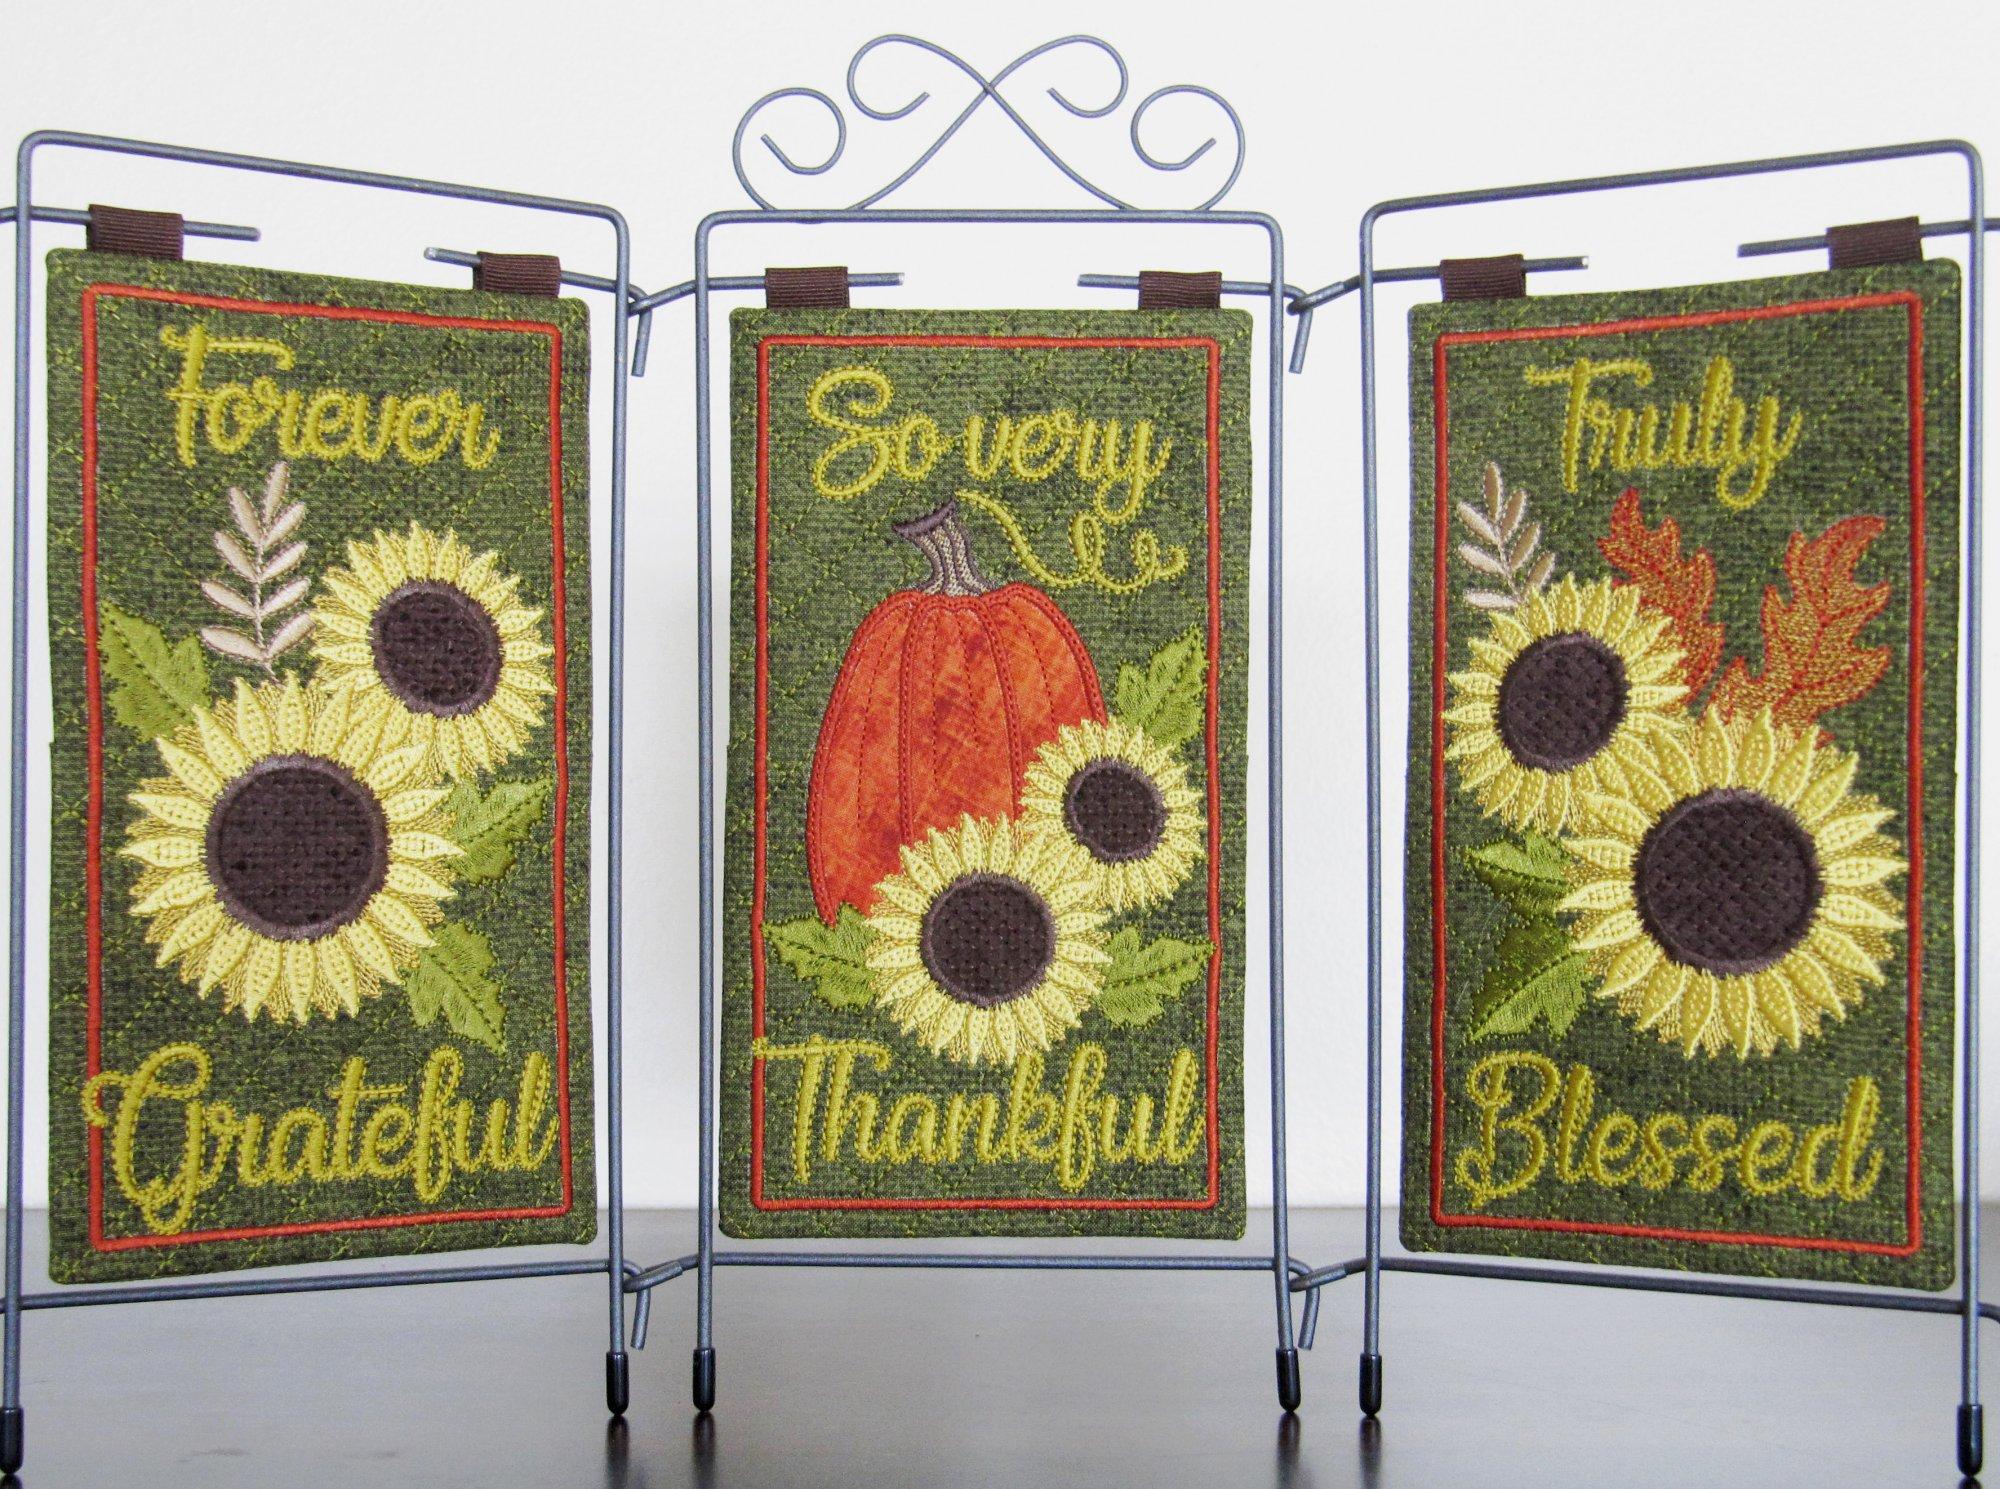 Grateful, Thankful, Blessed Tri- Pic Design